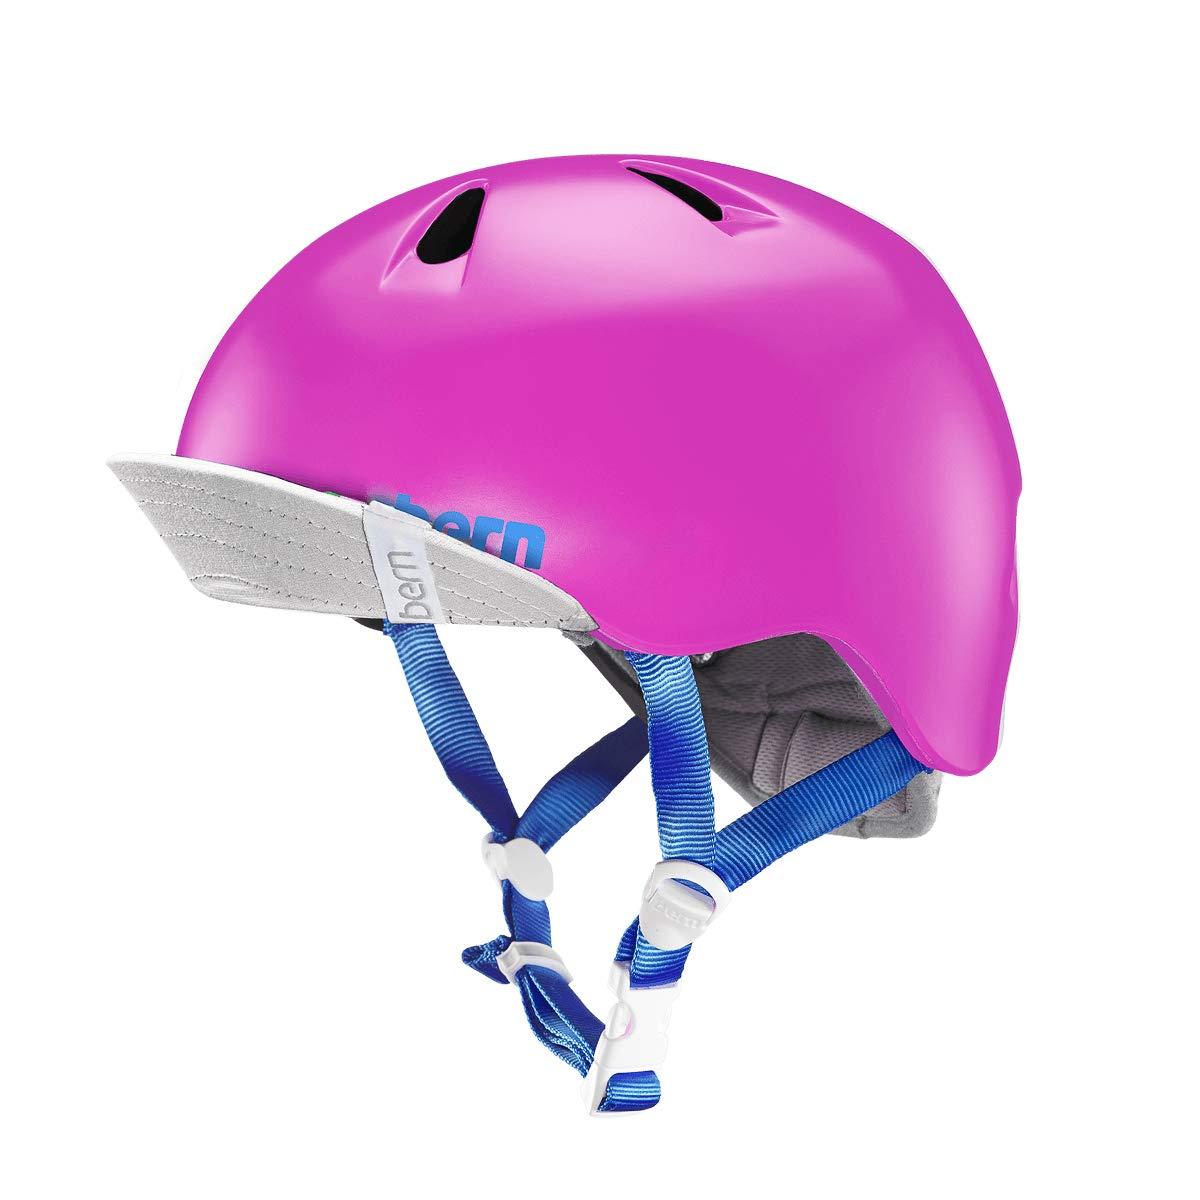 Bern Unlimited Jr. Nina Summer Helmet with Visor (Satin Hot Pink, XS/S)